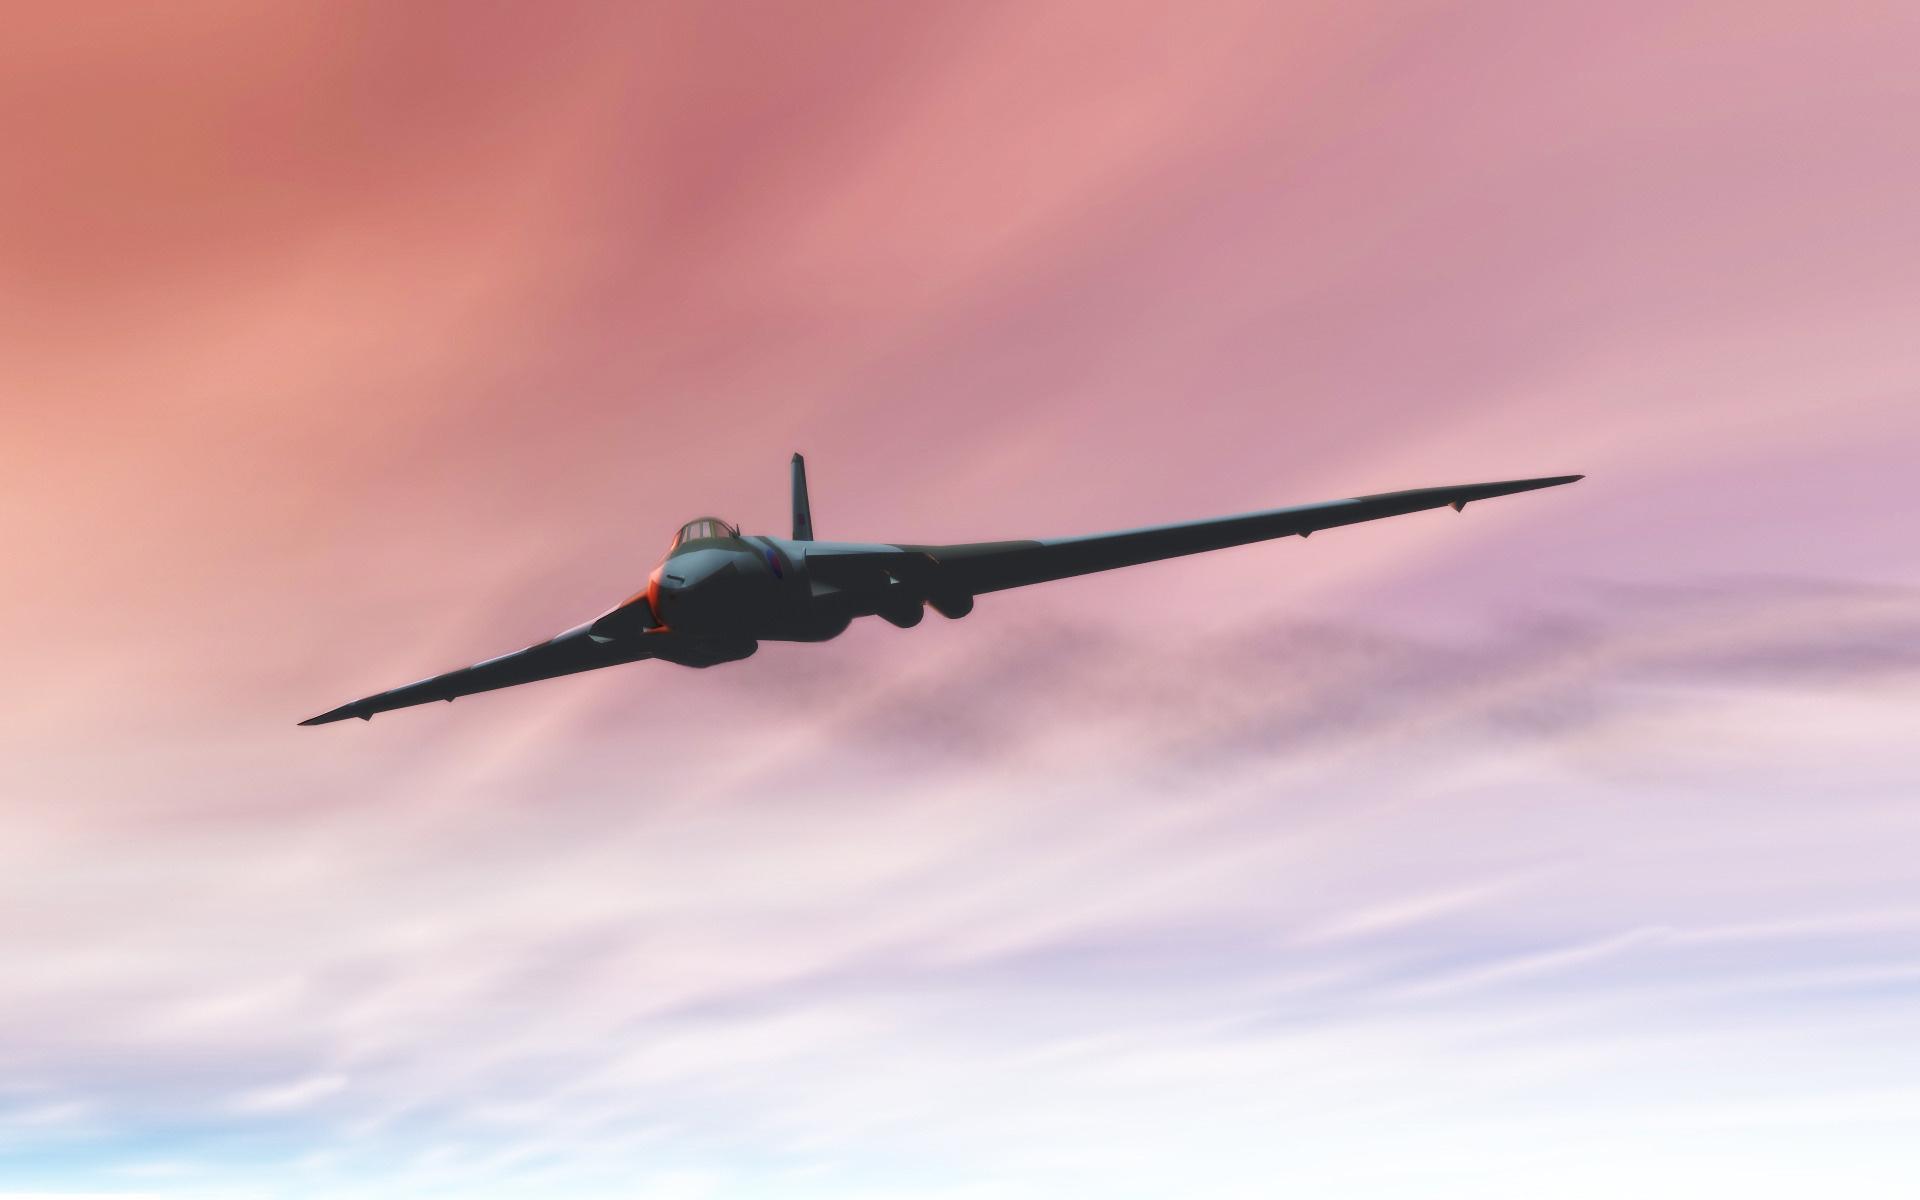 Avro Vulcan wallpapers HD quality